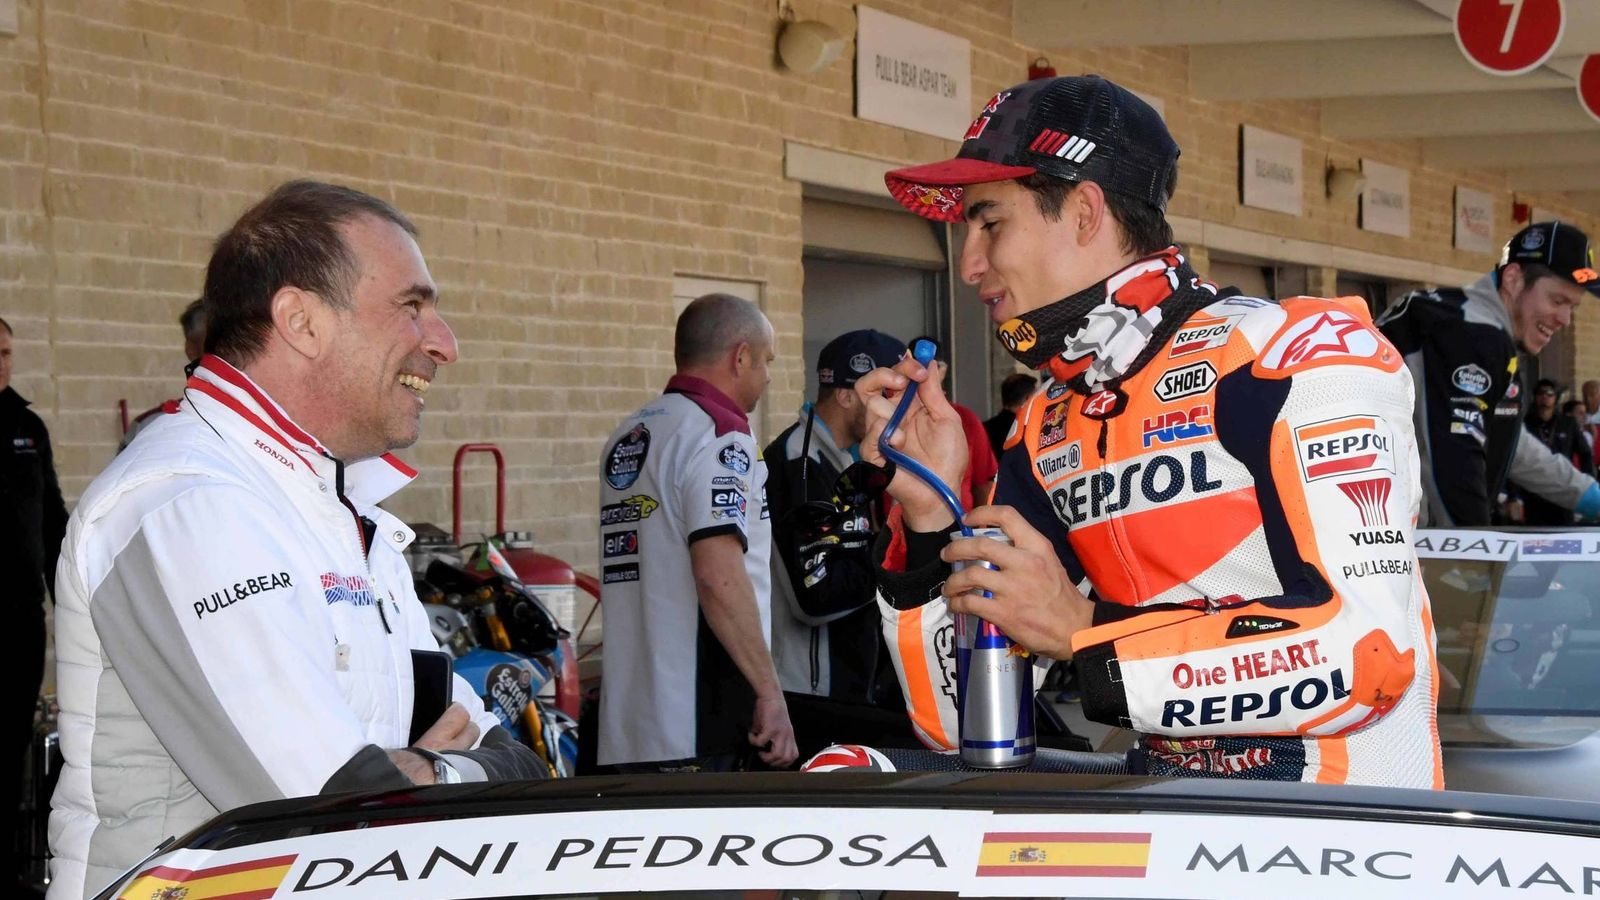 Foto: Livio Suppo habla con Marc Márquez en Austin esta temporada. (Italy Photo Press via ZUMA Press)